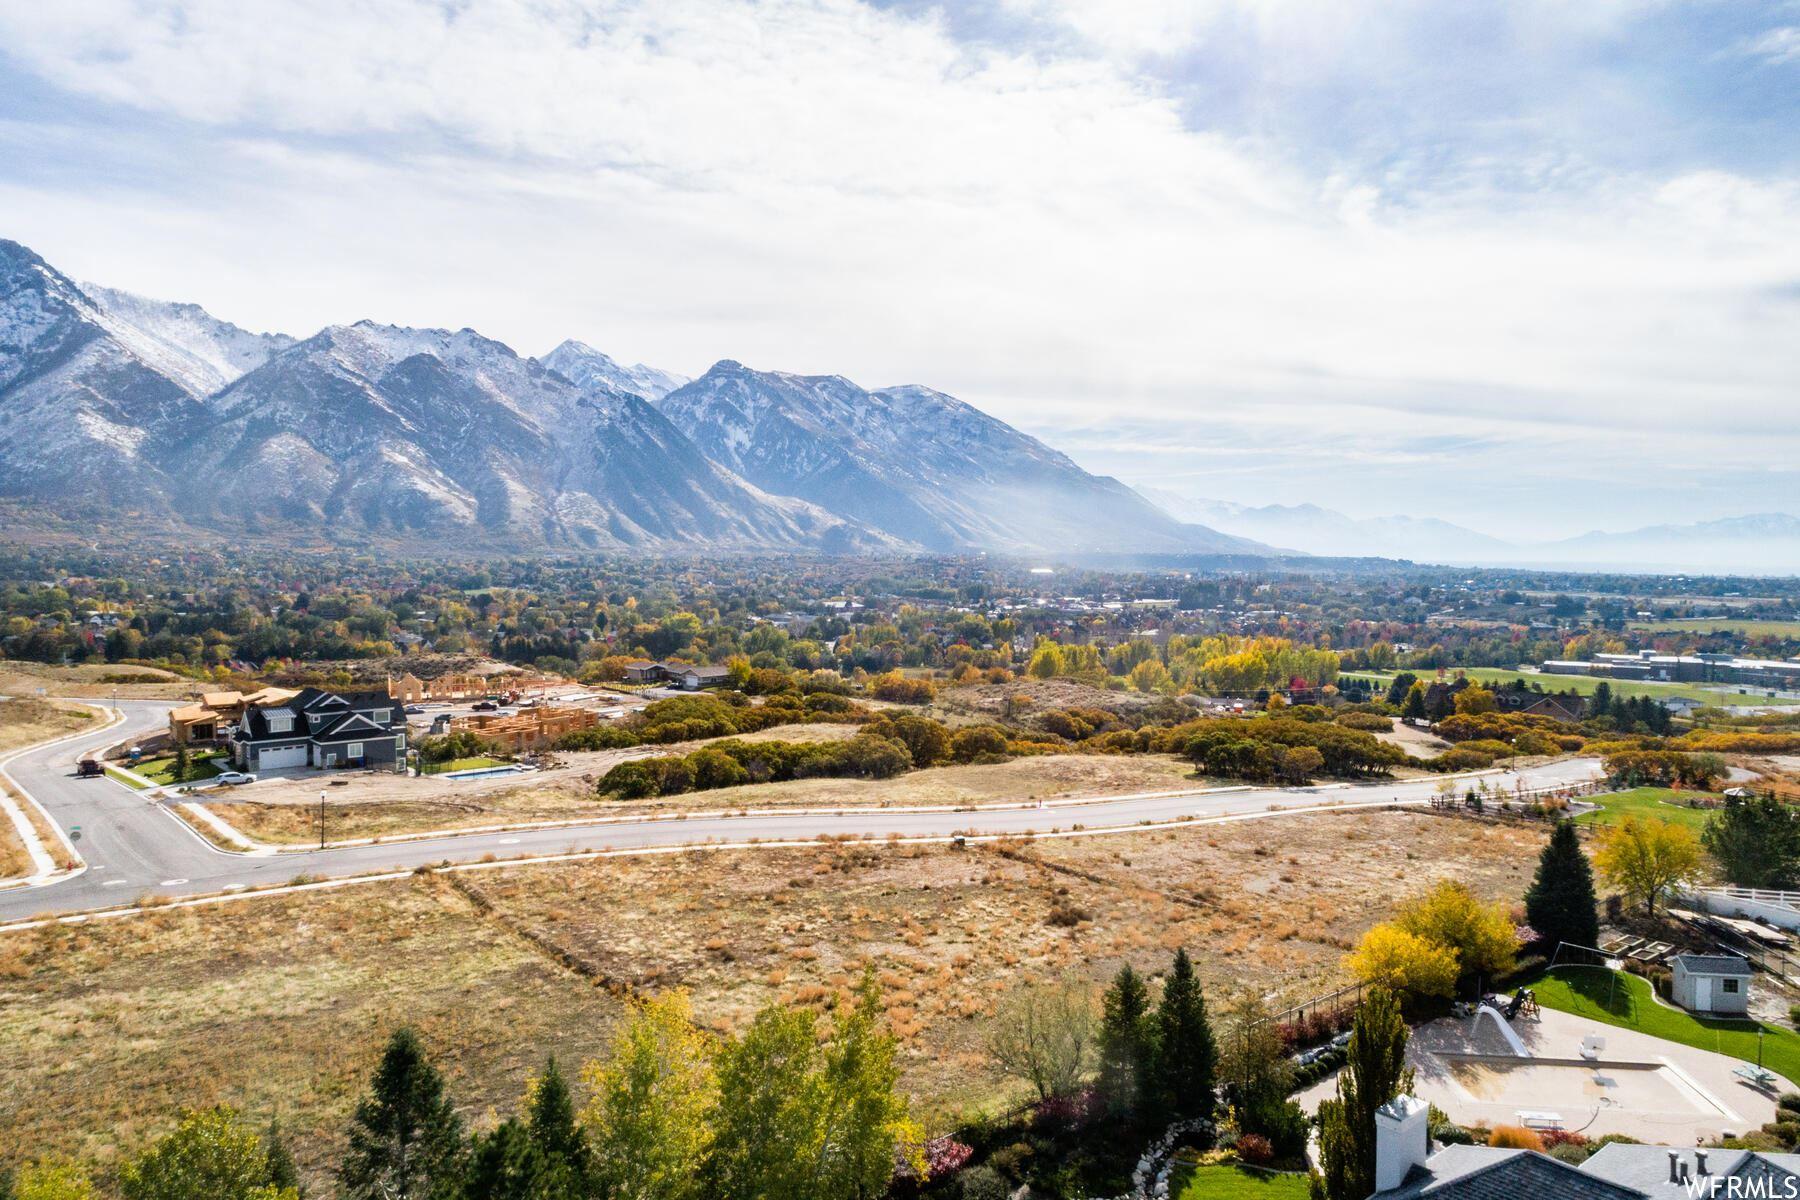 Photo of 367 N BLUE SPRUCE W RD #3, Alpine, UT 84004 (MLS # 1775939)